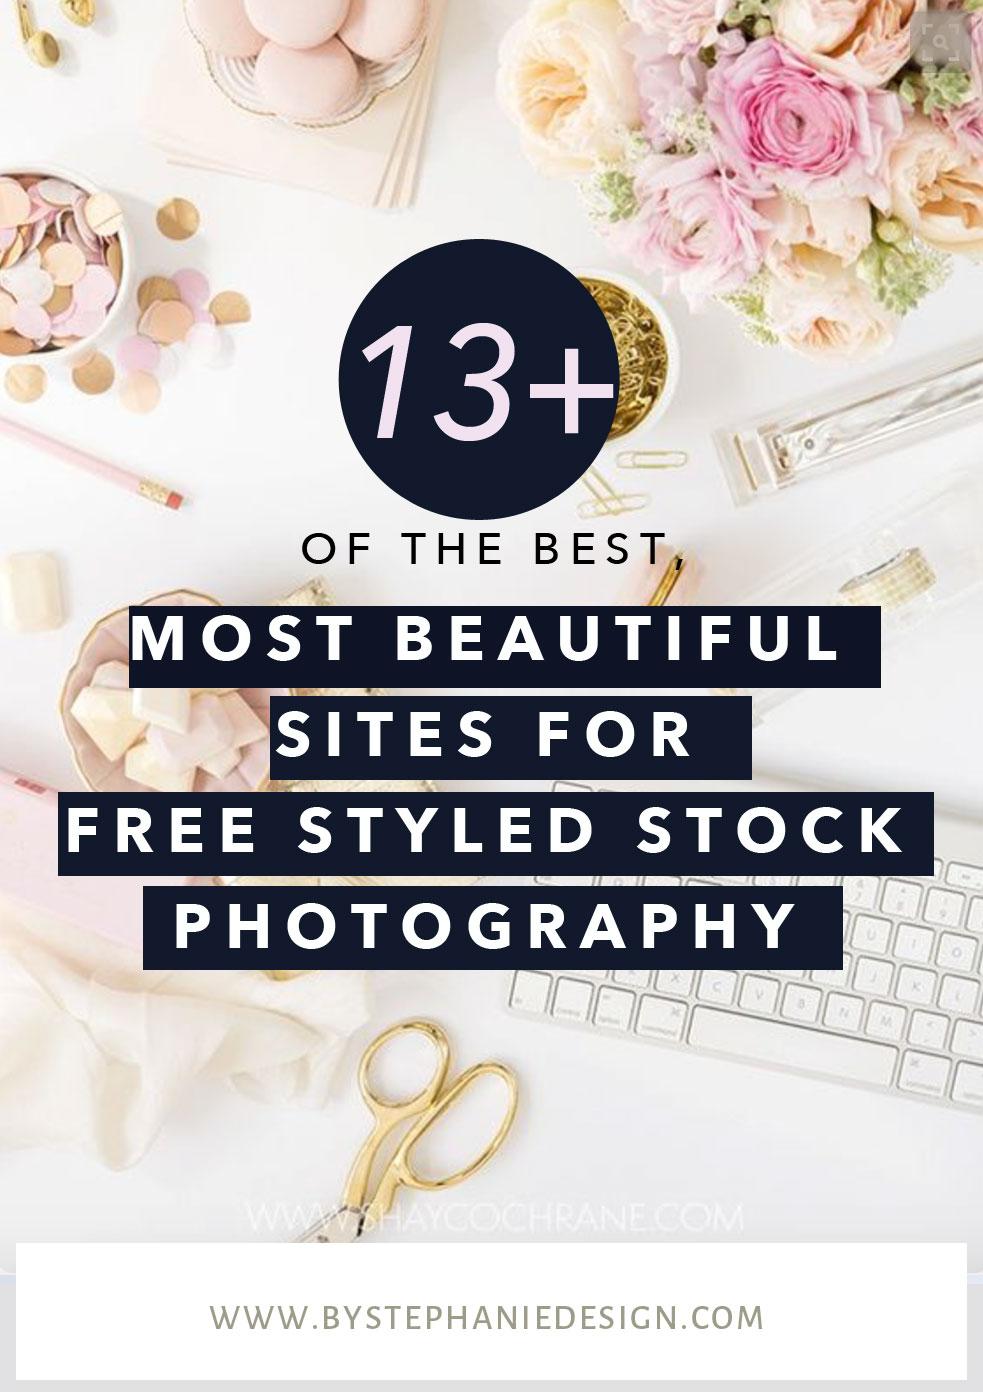 free feminine styled stock photography - by stephanie design